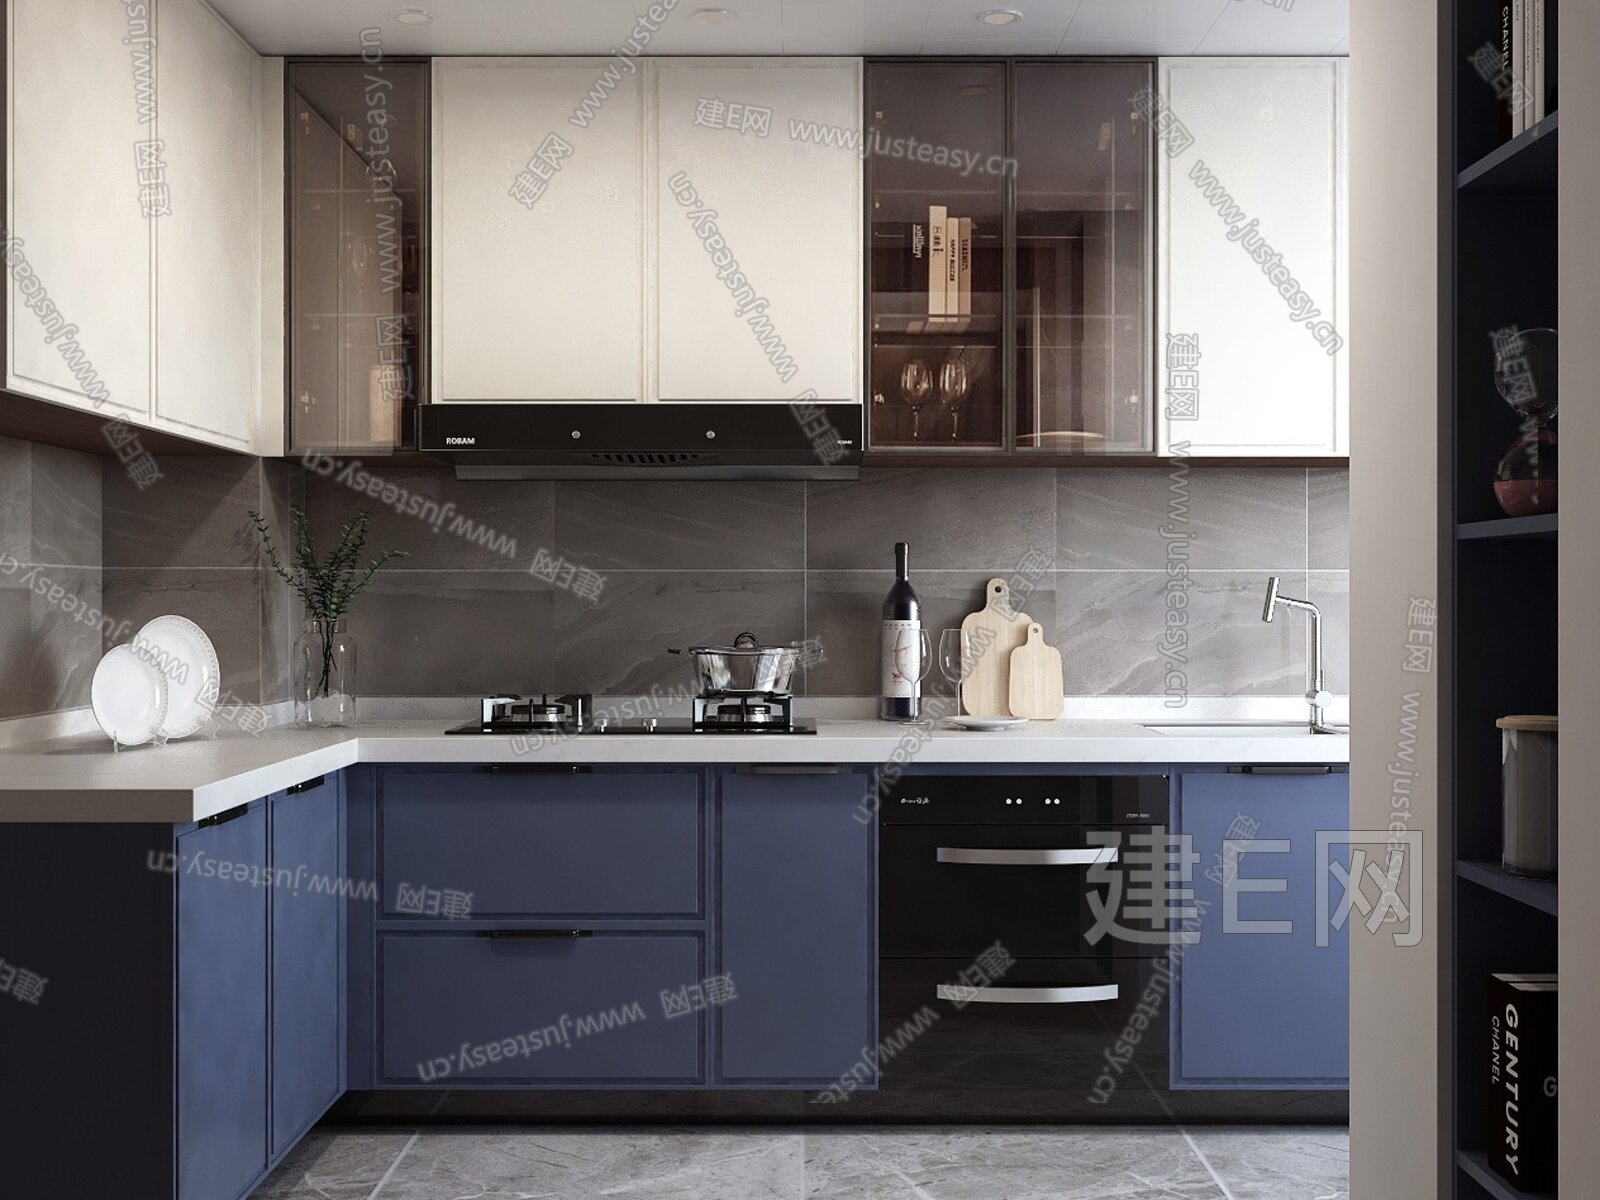 EASE 东巷轻素 现代开放厨房 3d模型